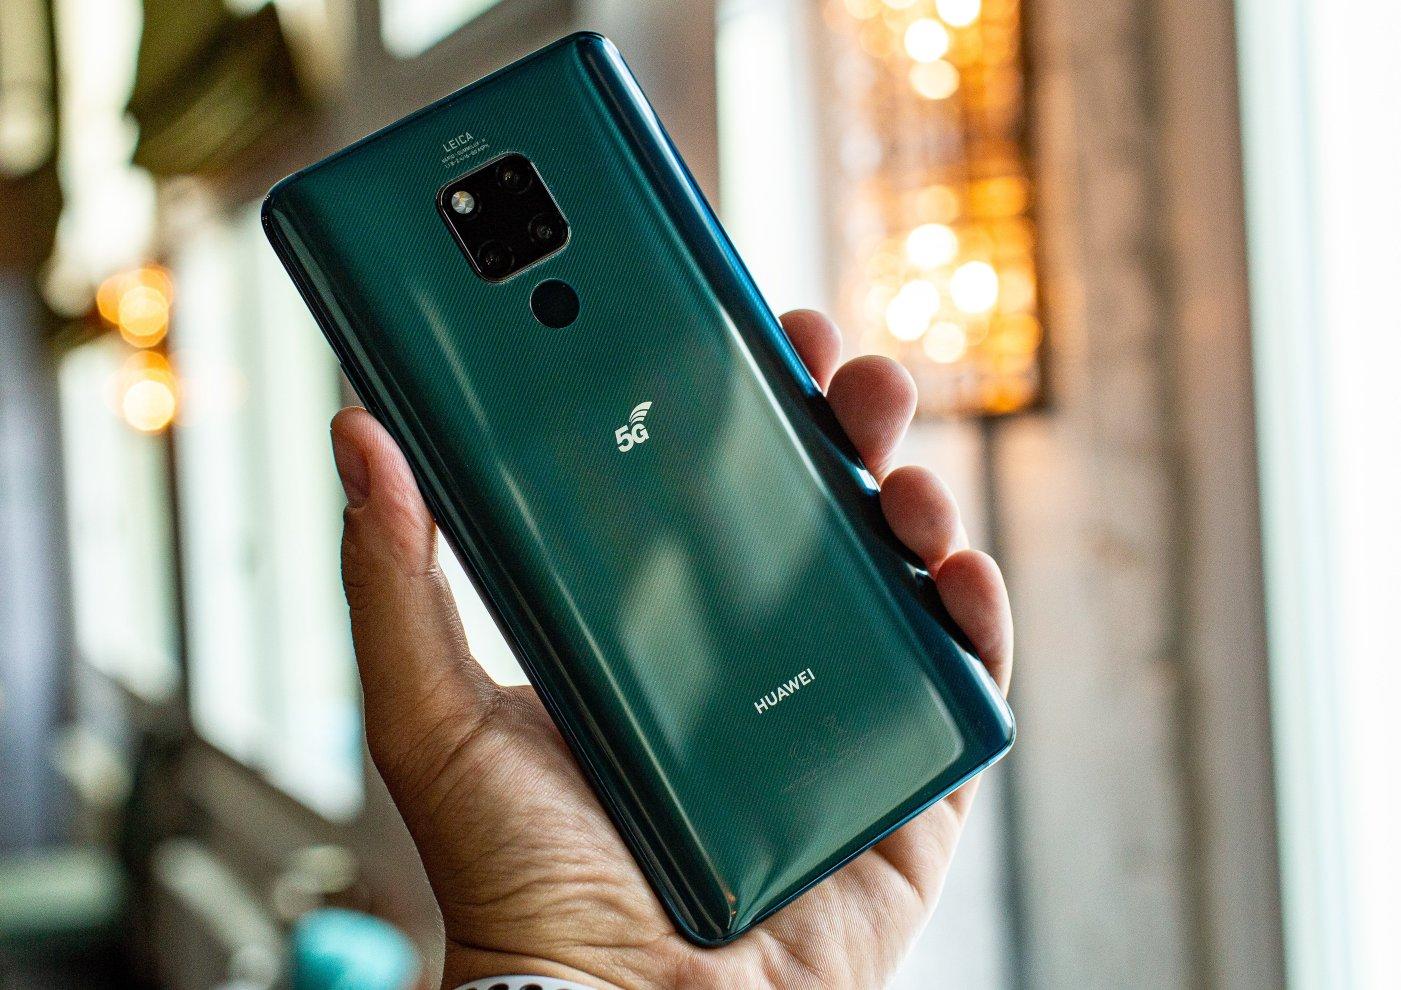 Novo telemóvel Huawei Mate 20 X 5G